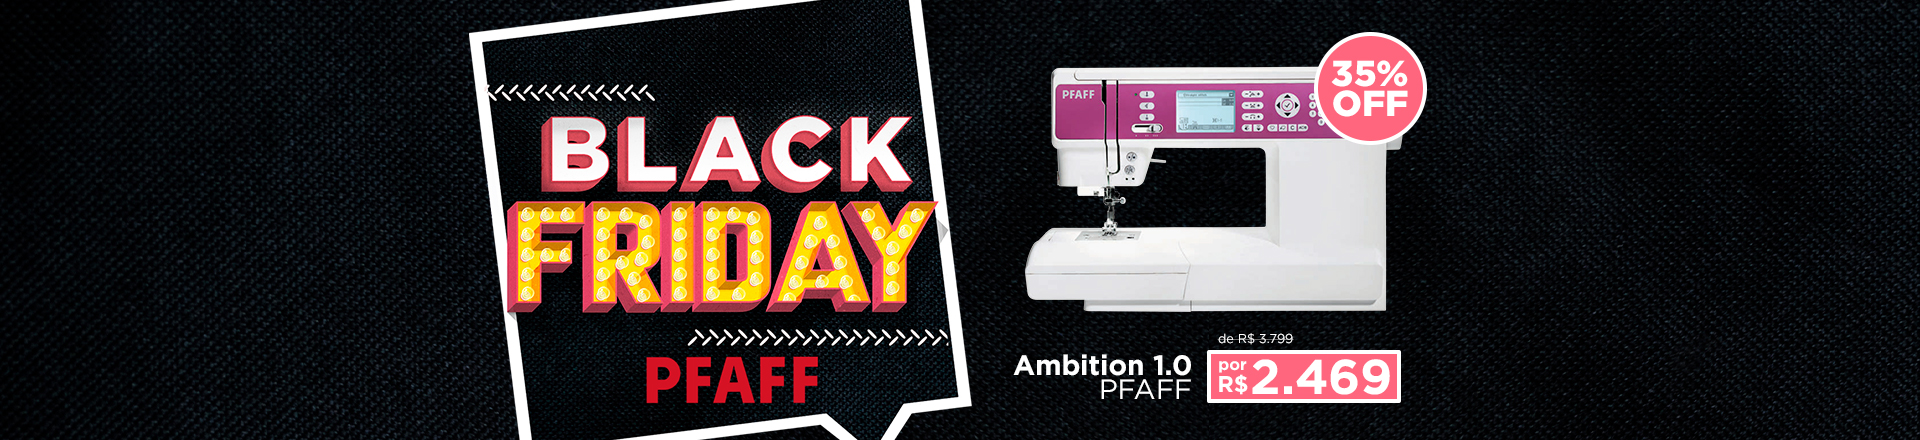 banner-bf-ambition-1.0-pfaff-desk